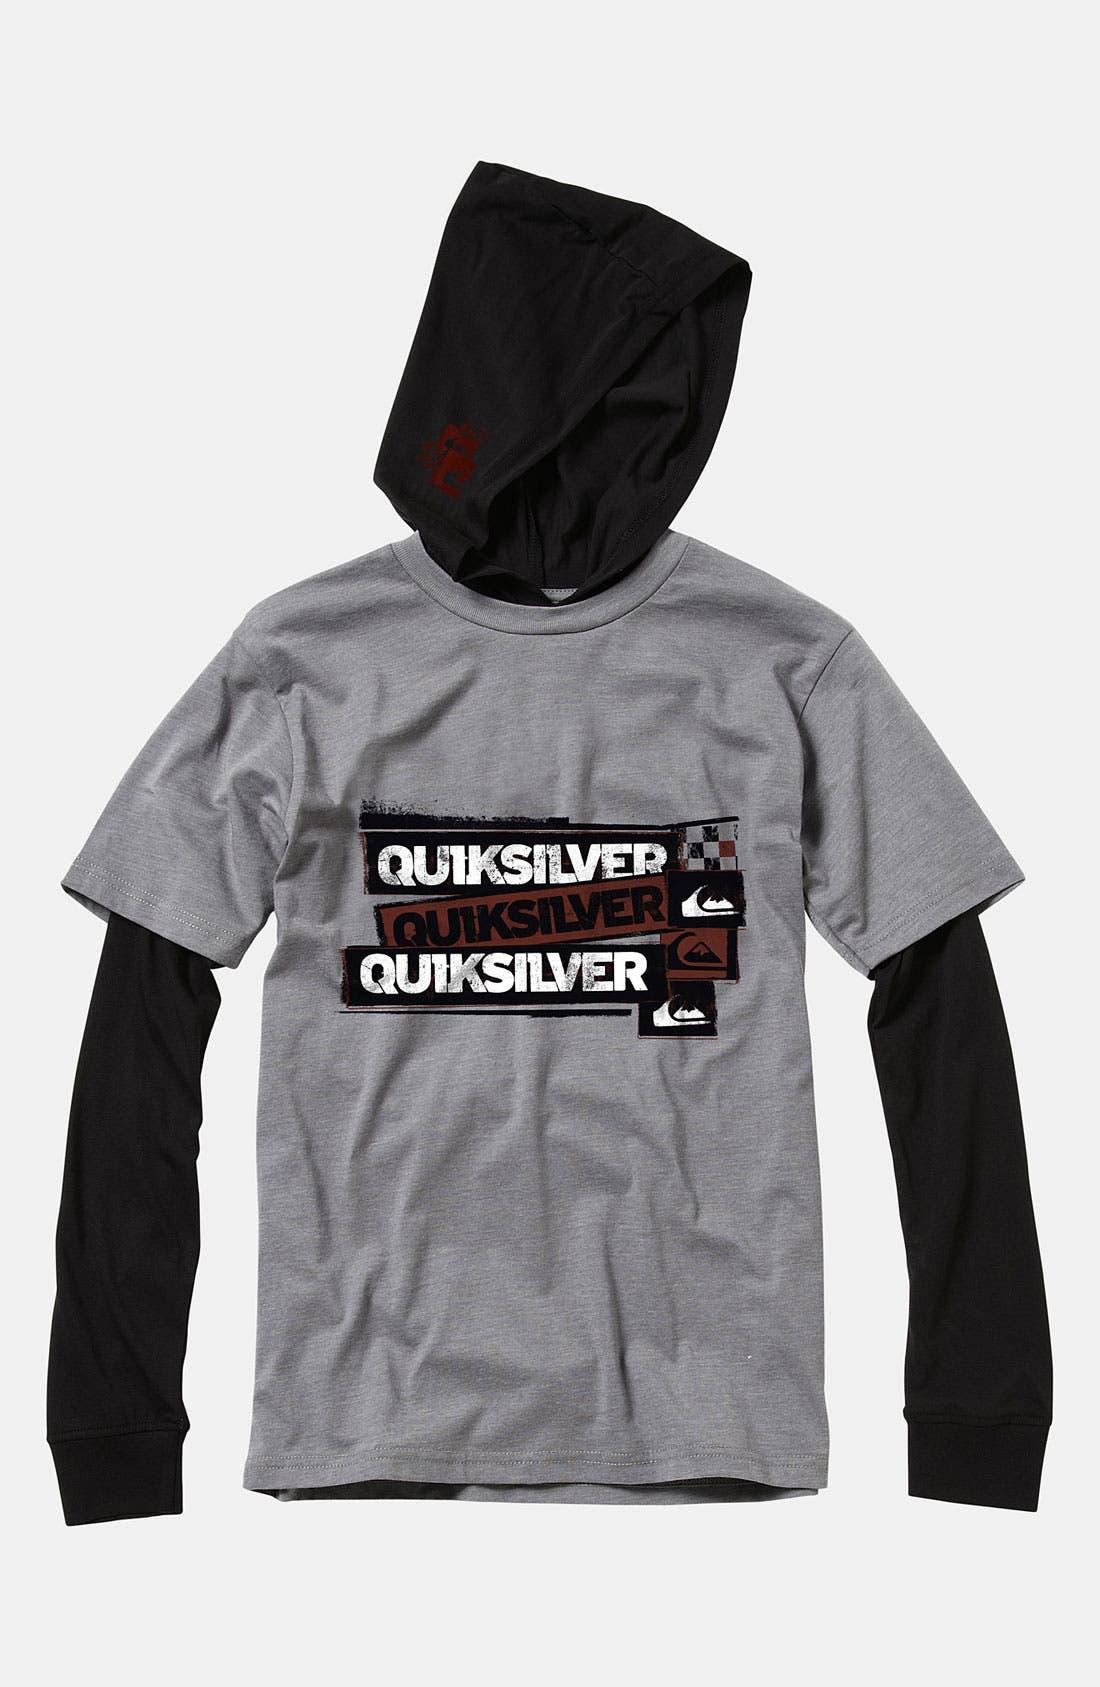 Alternate Image 1 Selected - Quiksilver 'Meddle' Layered Sleeve Hoodie (Toddler)